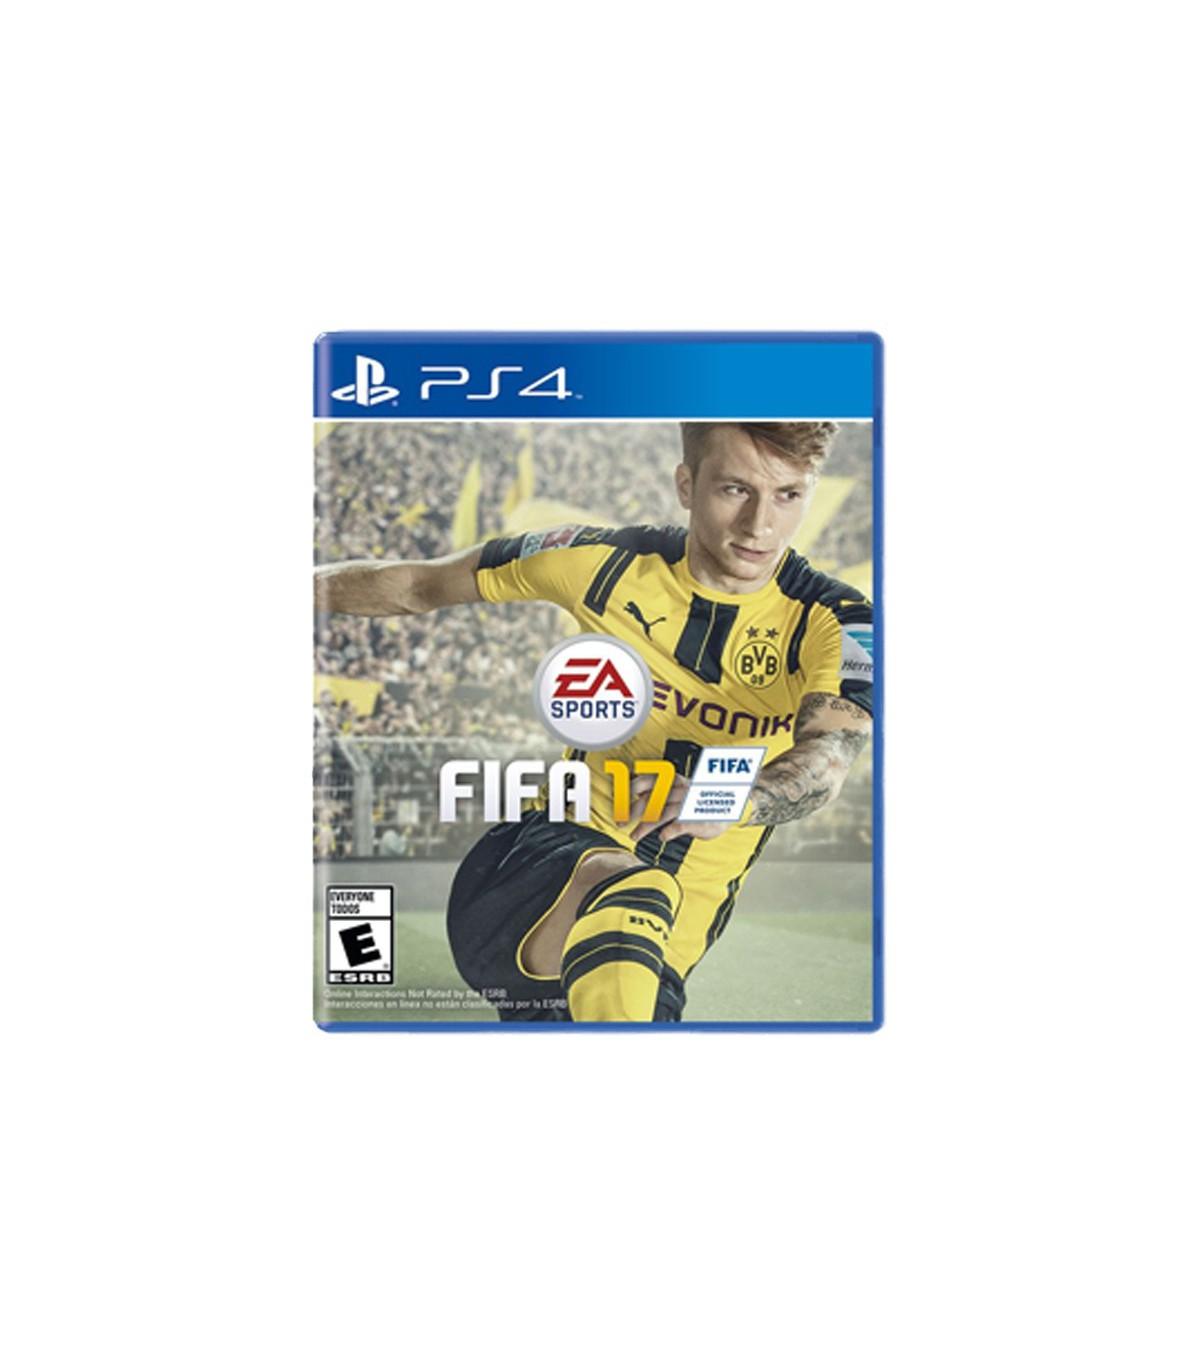 Fifa 17 کارکرده - پلی استیشن ۴